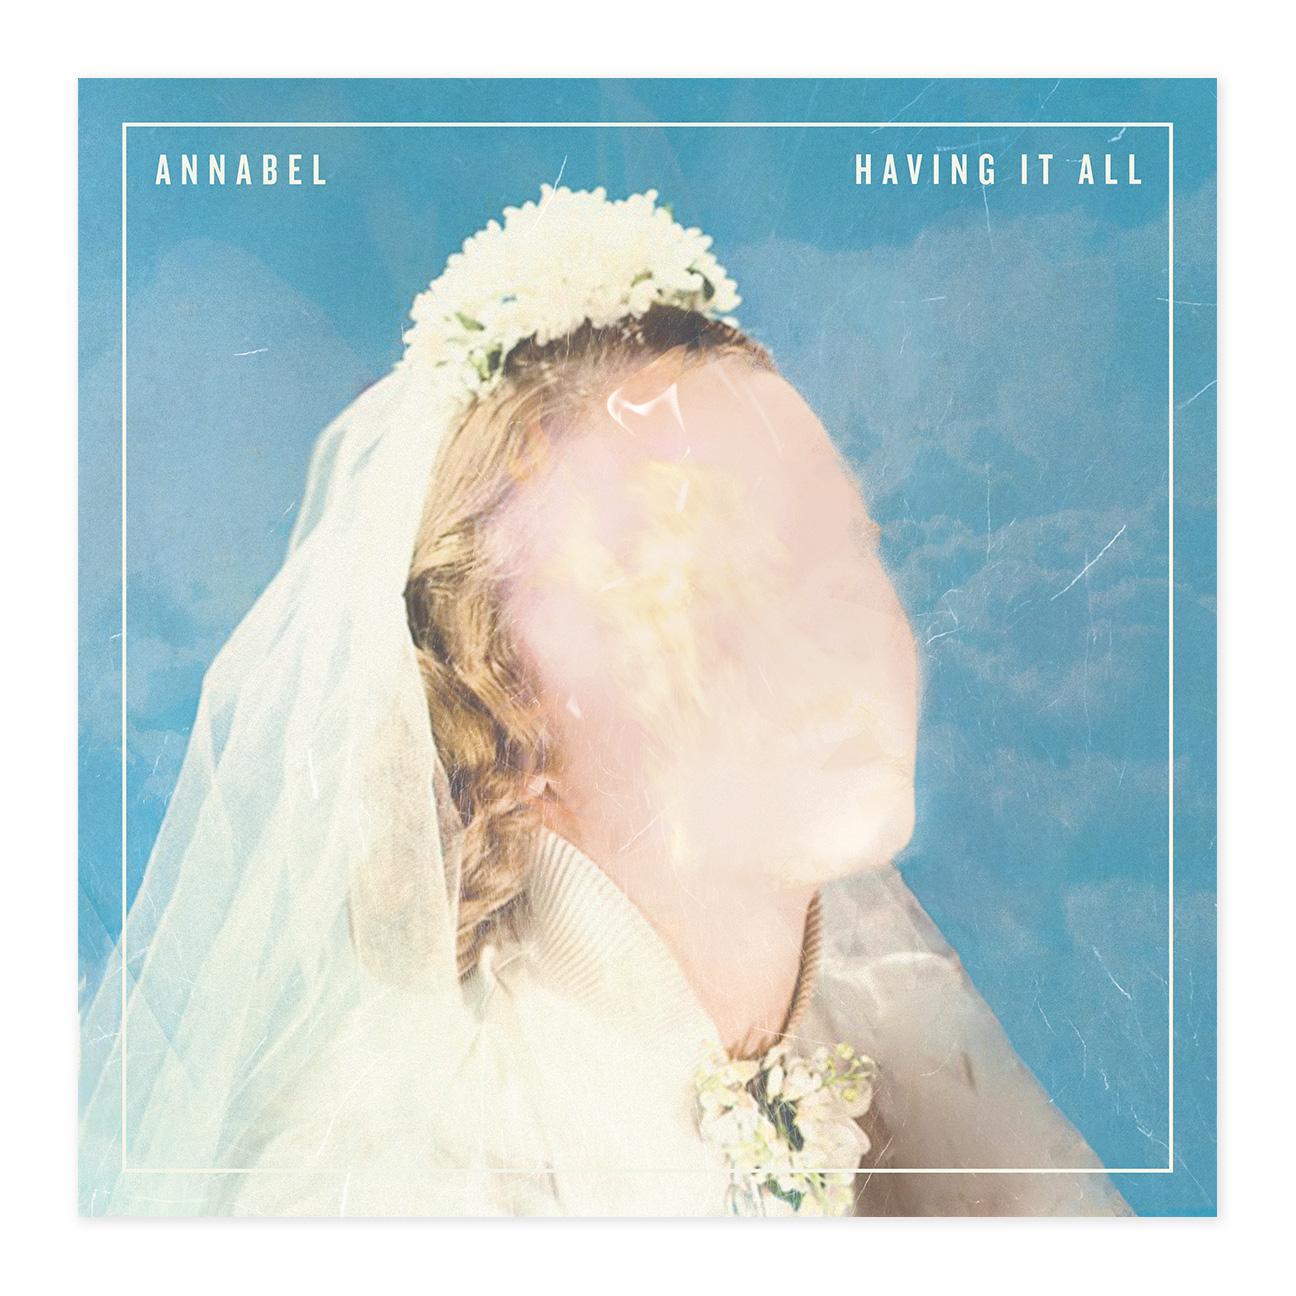 Album-Covers-Annabel-HIA.jpg